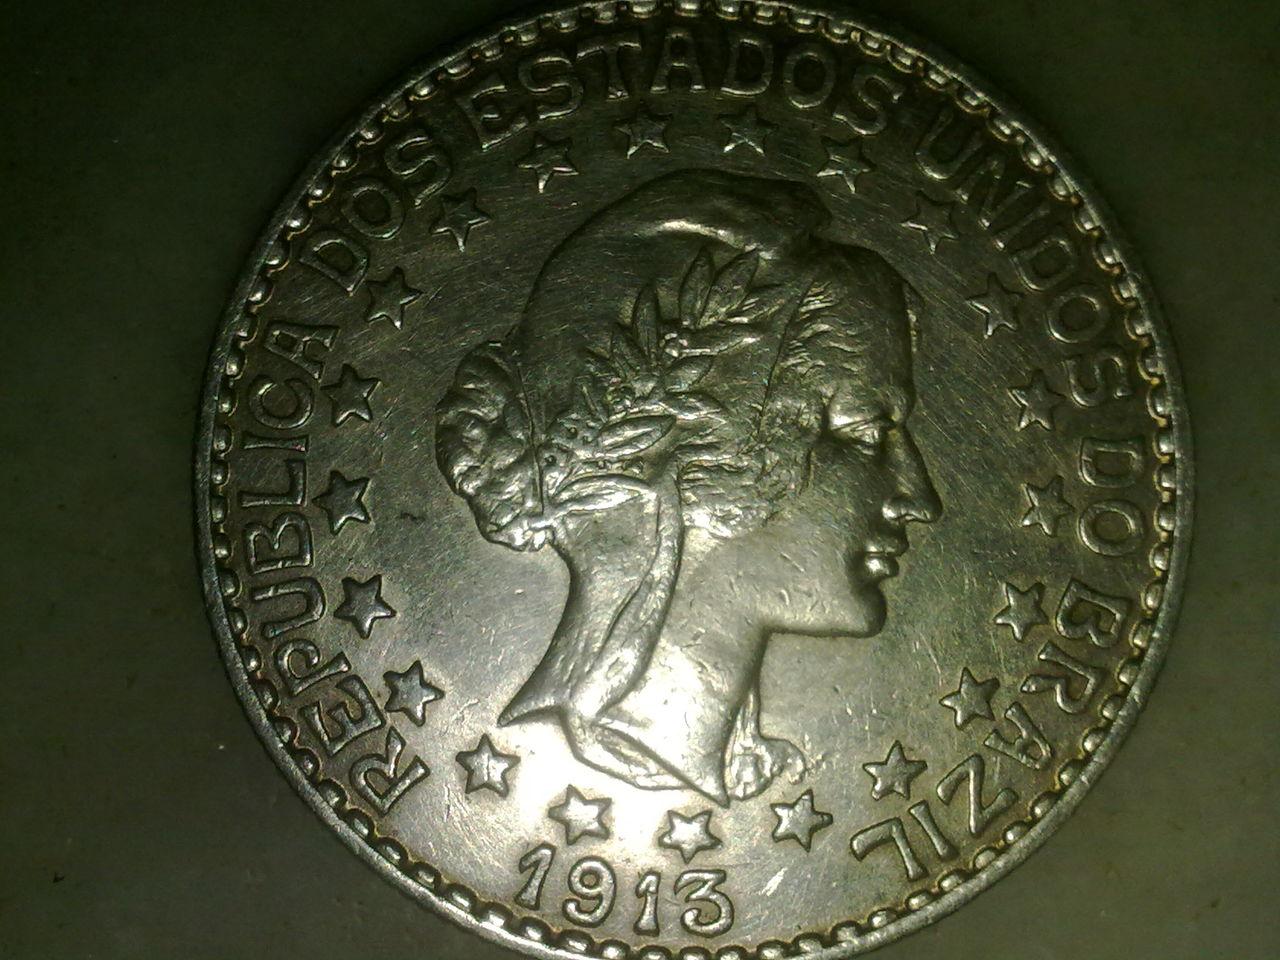 2000 Reis 1907 Brasil Pppppppp_002